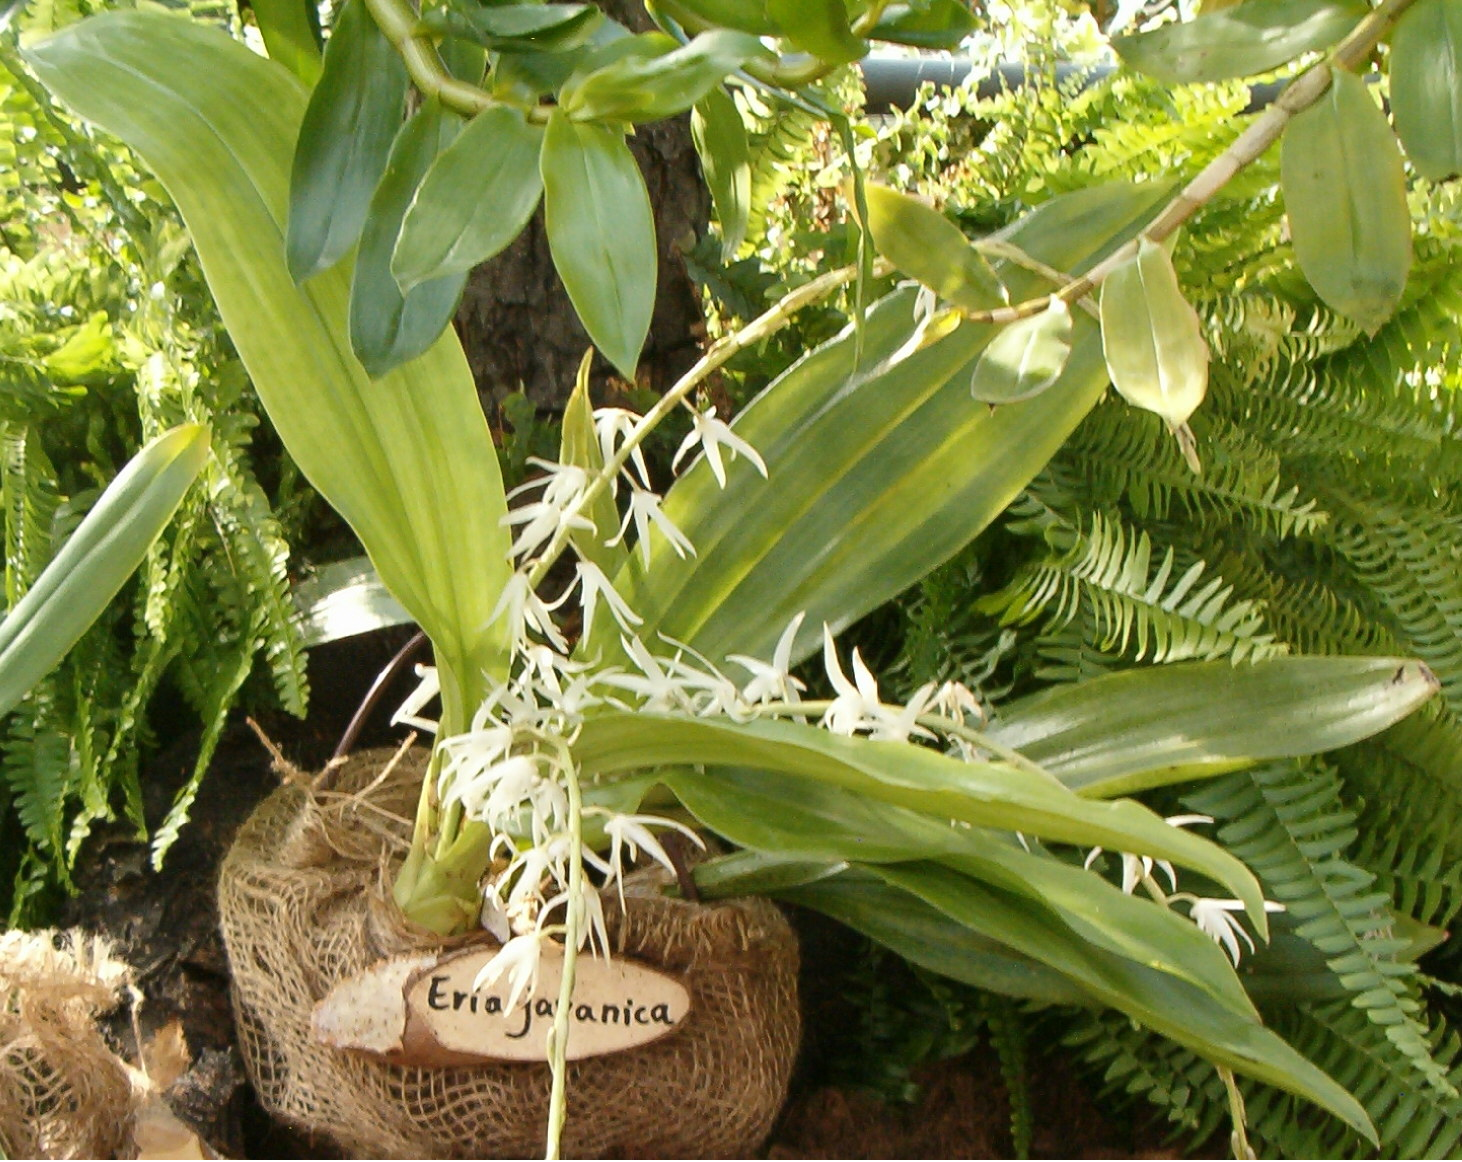 http://upload.wikimedia.org/wikipedia/commons/e/e3/Eria_javanica_OrchidsBln0906.jpg